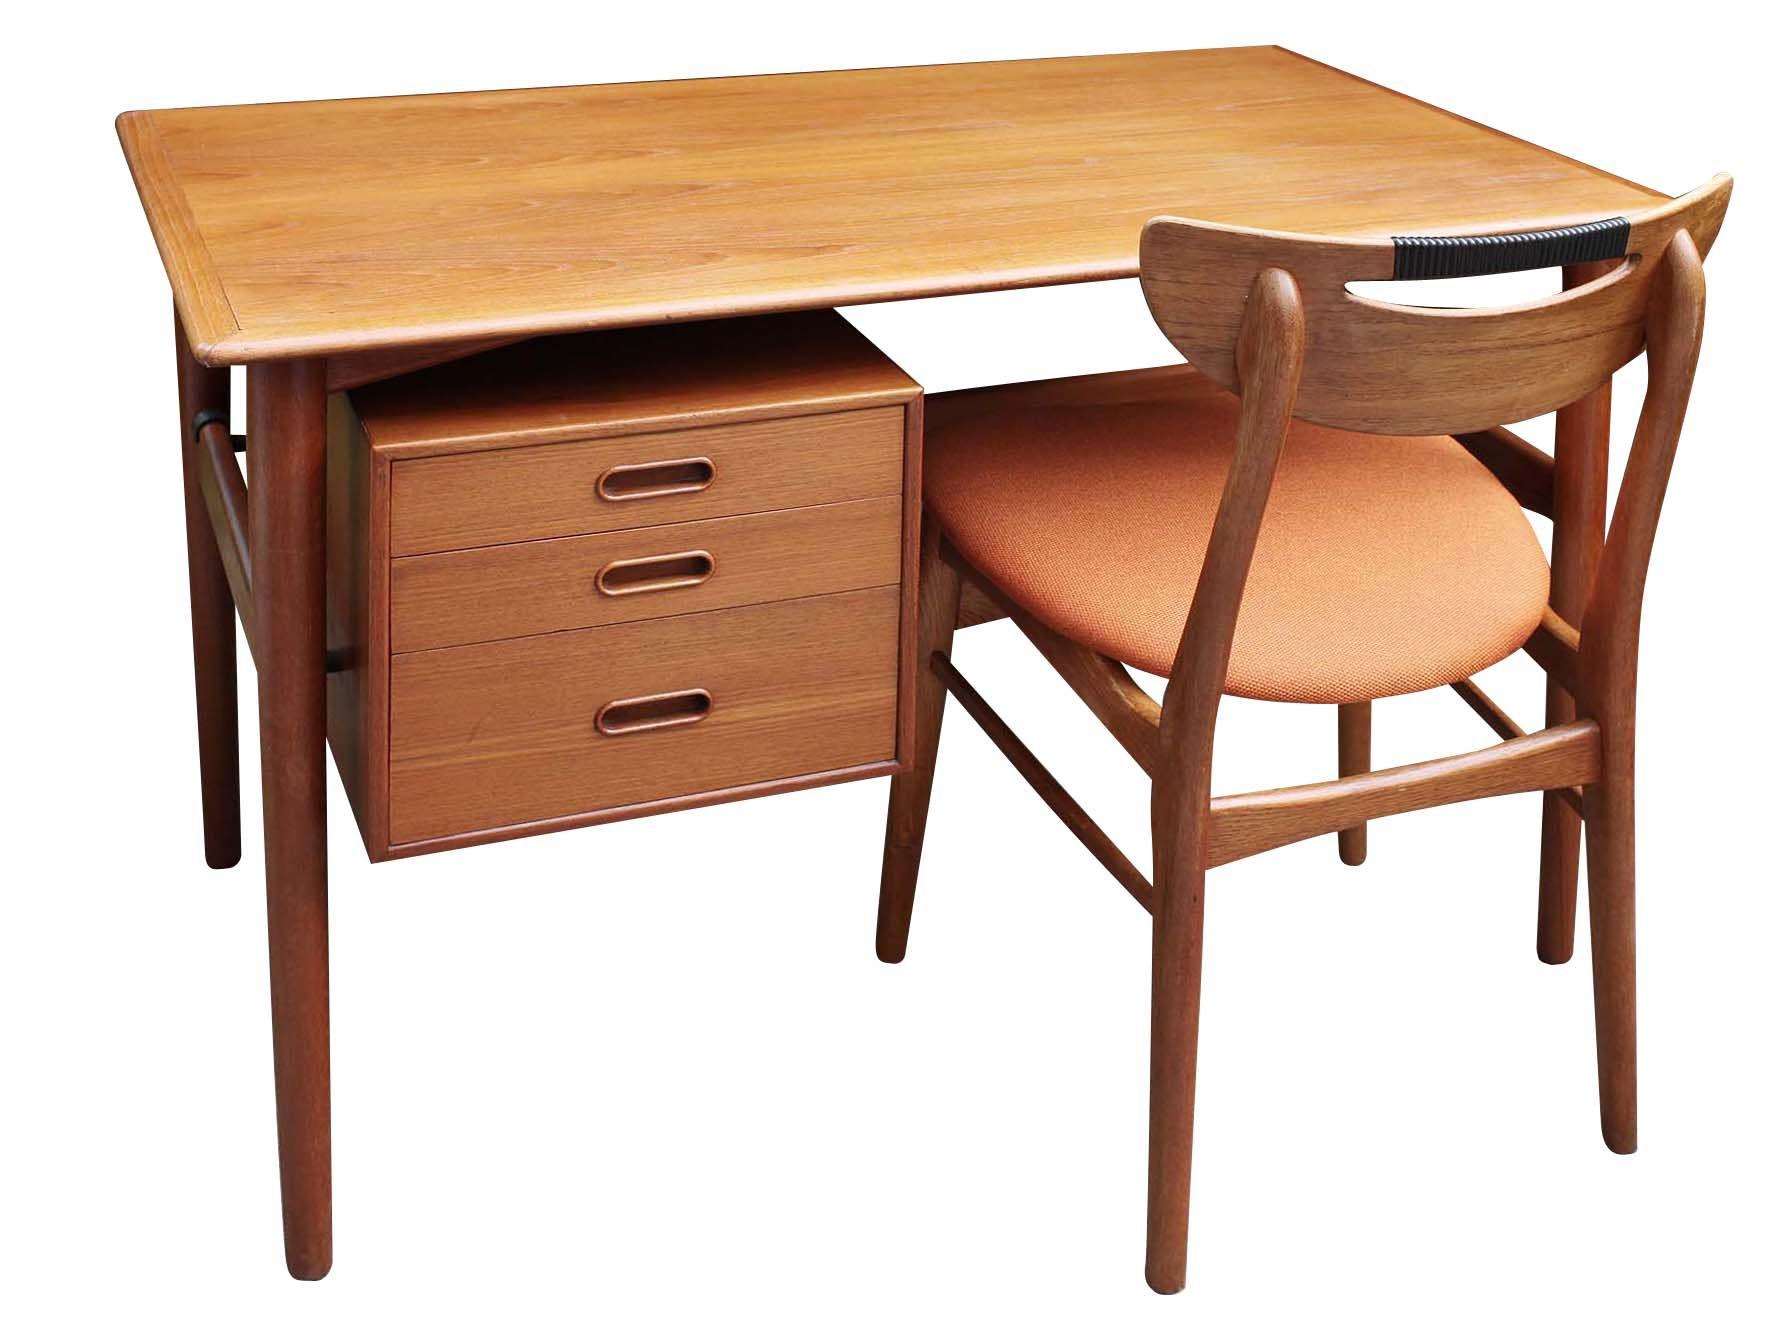 Danish desk. Biurko, drewno tekowe, cena 2700 zł, dł. 110